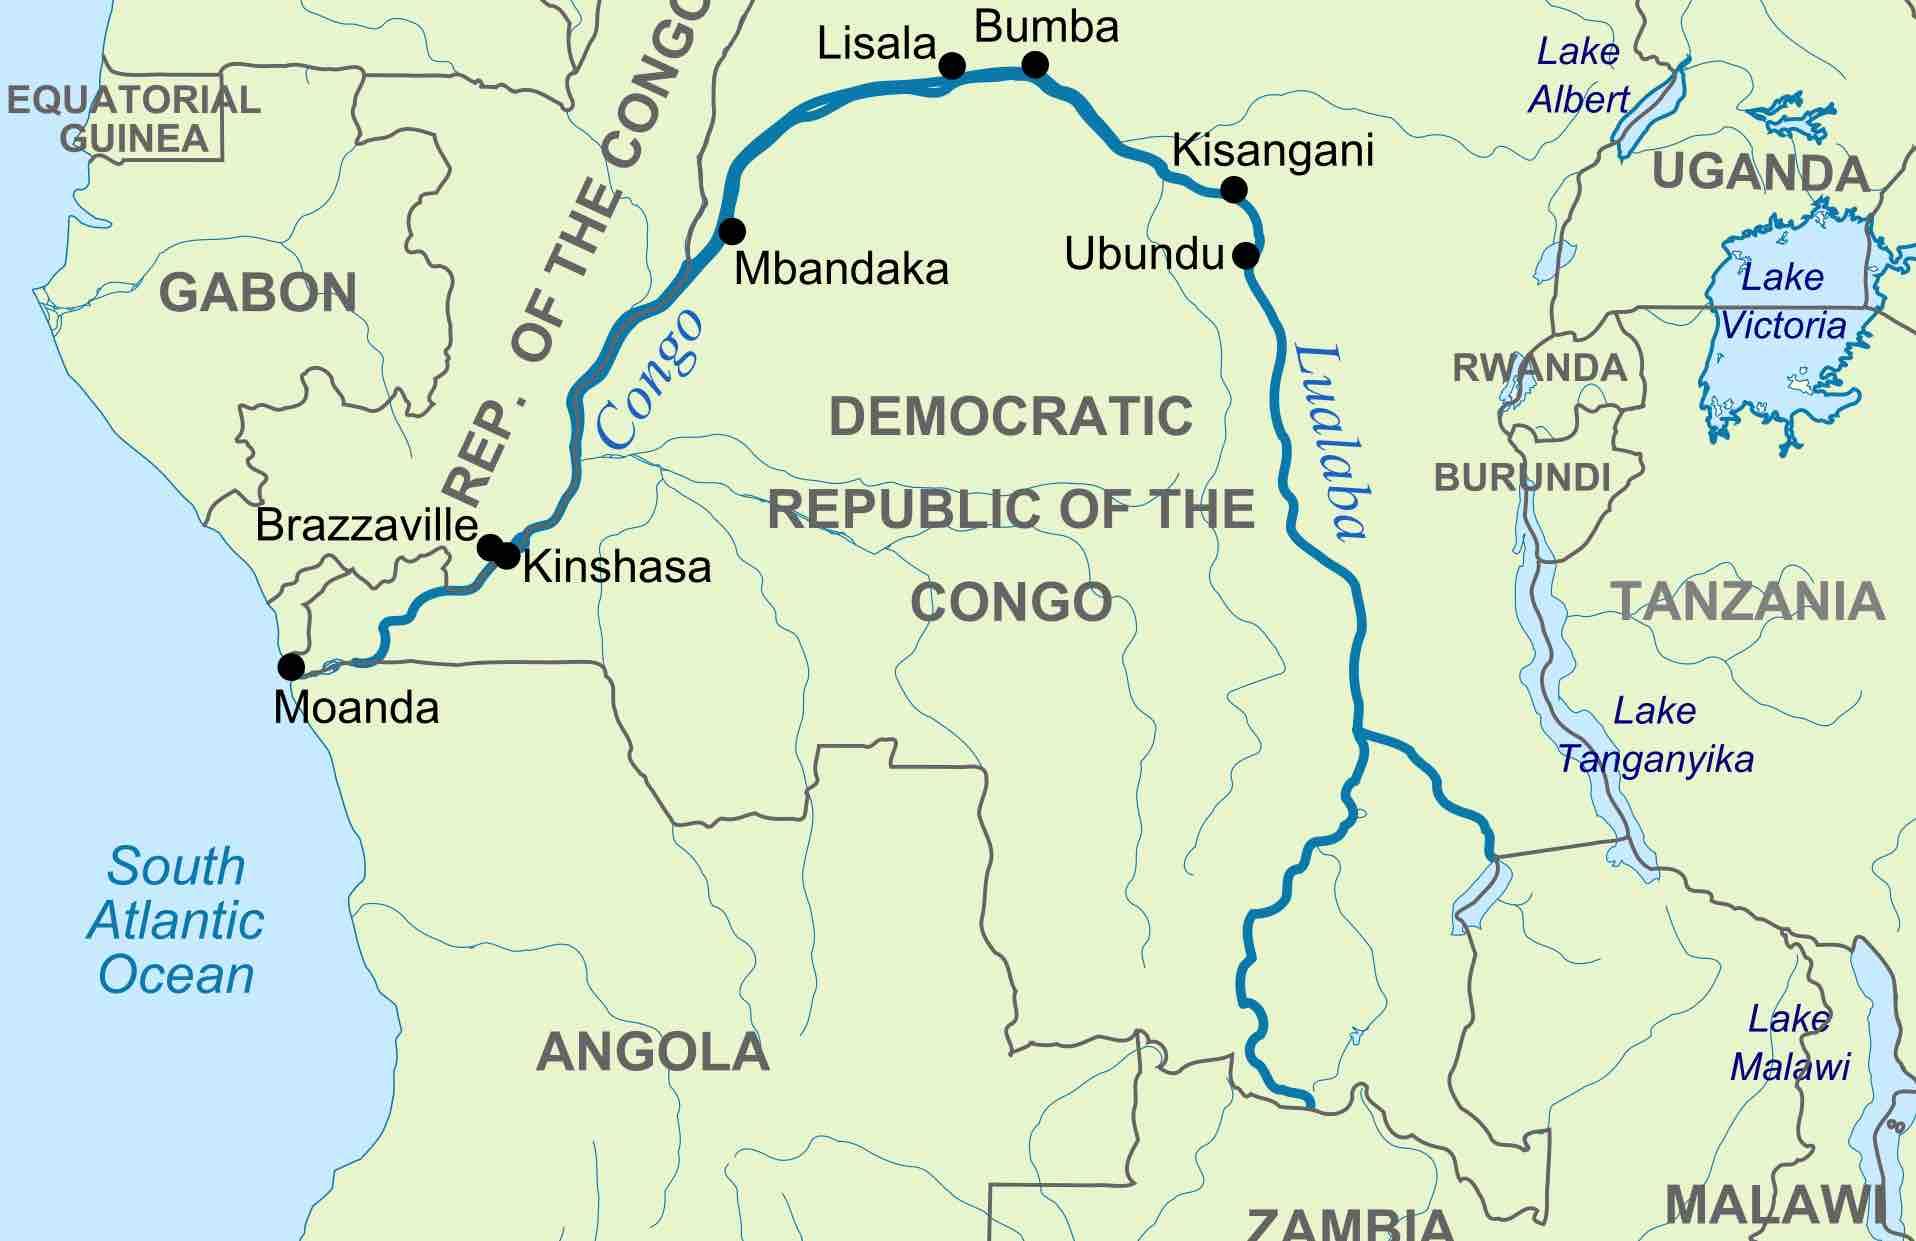 описание реки конго по плану